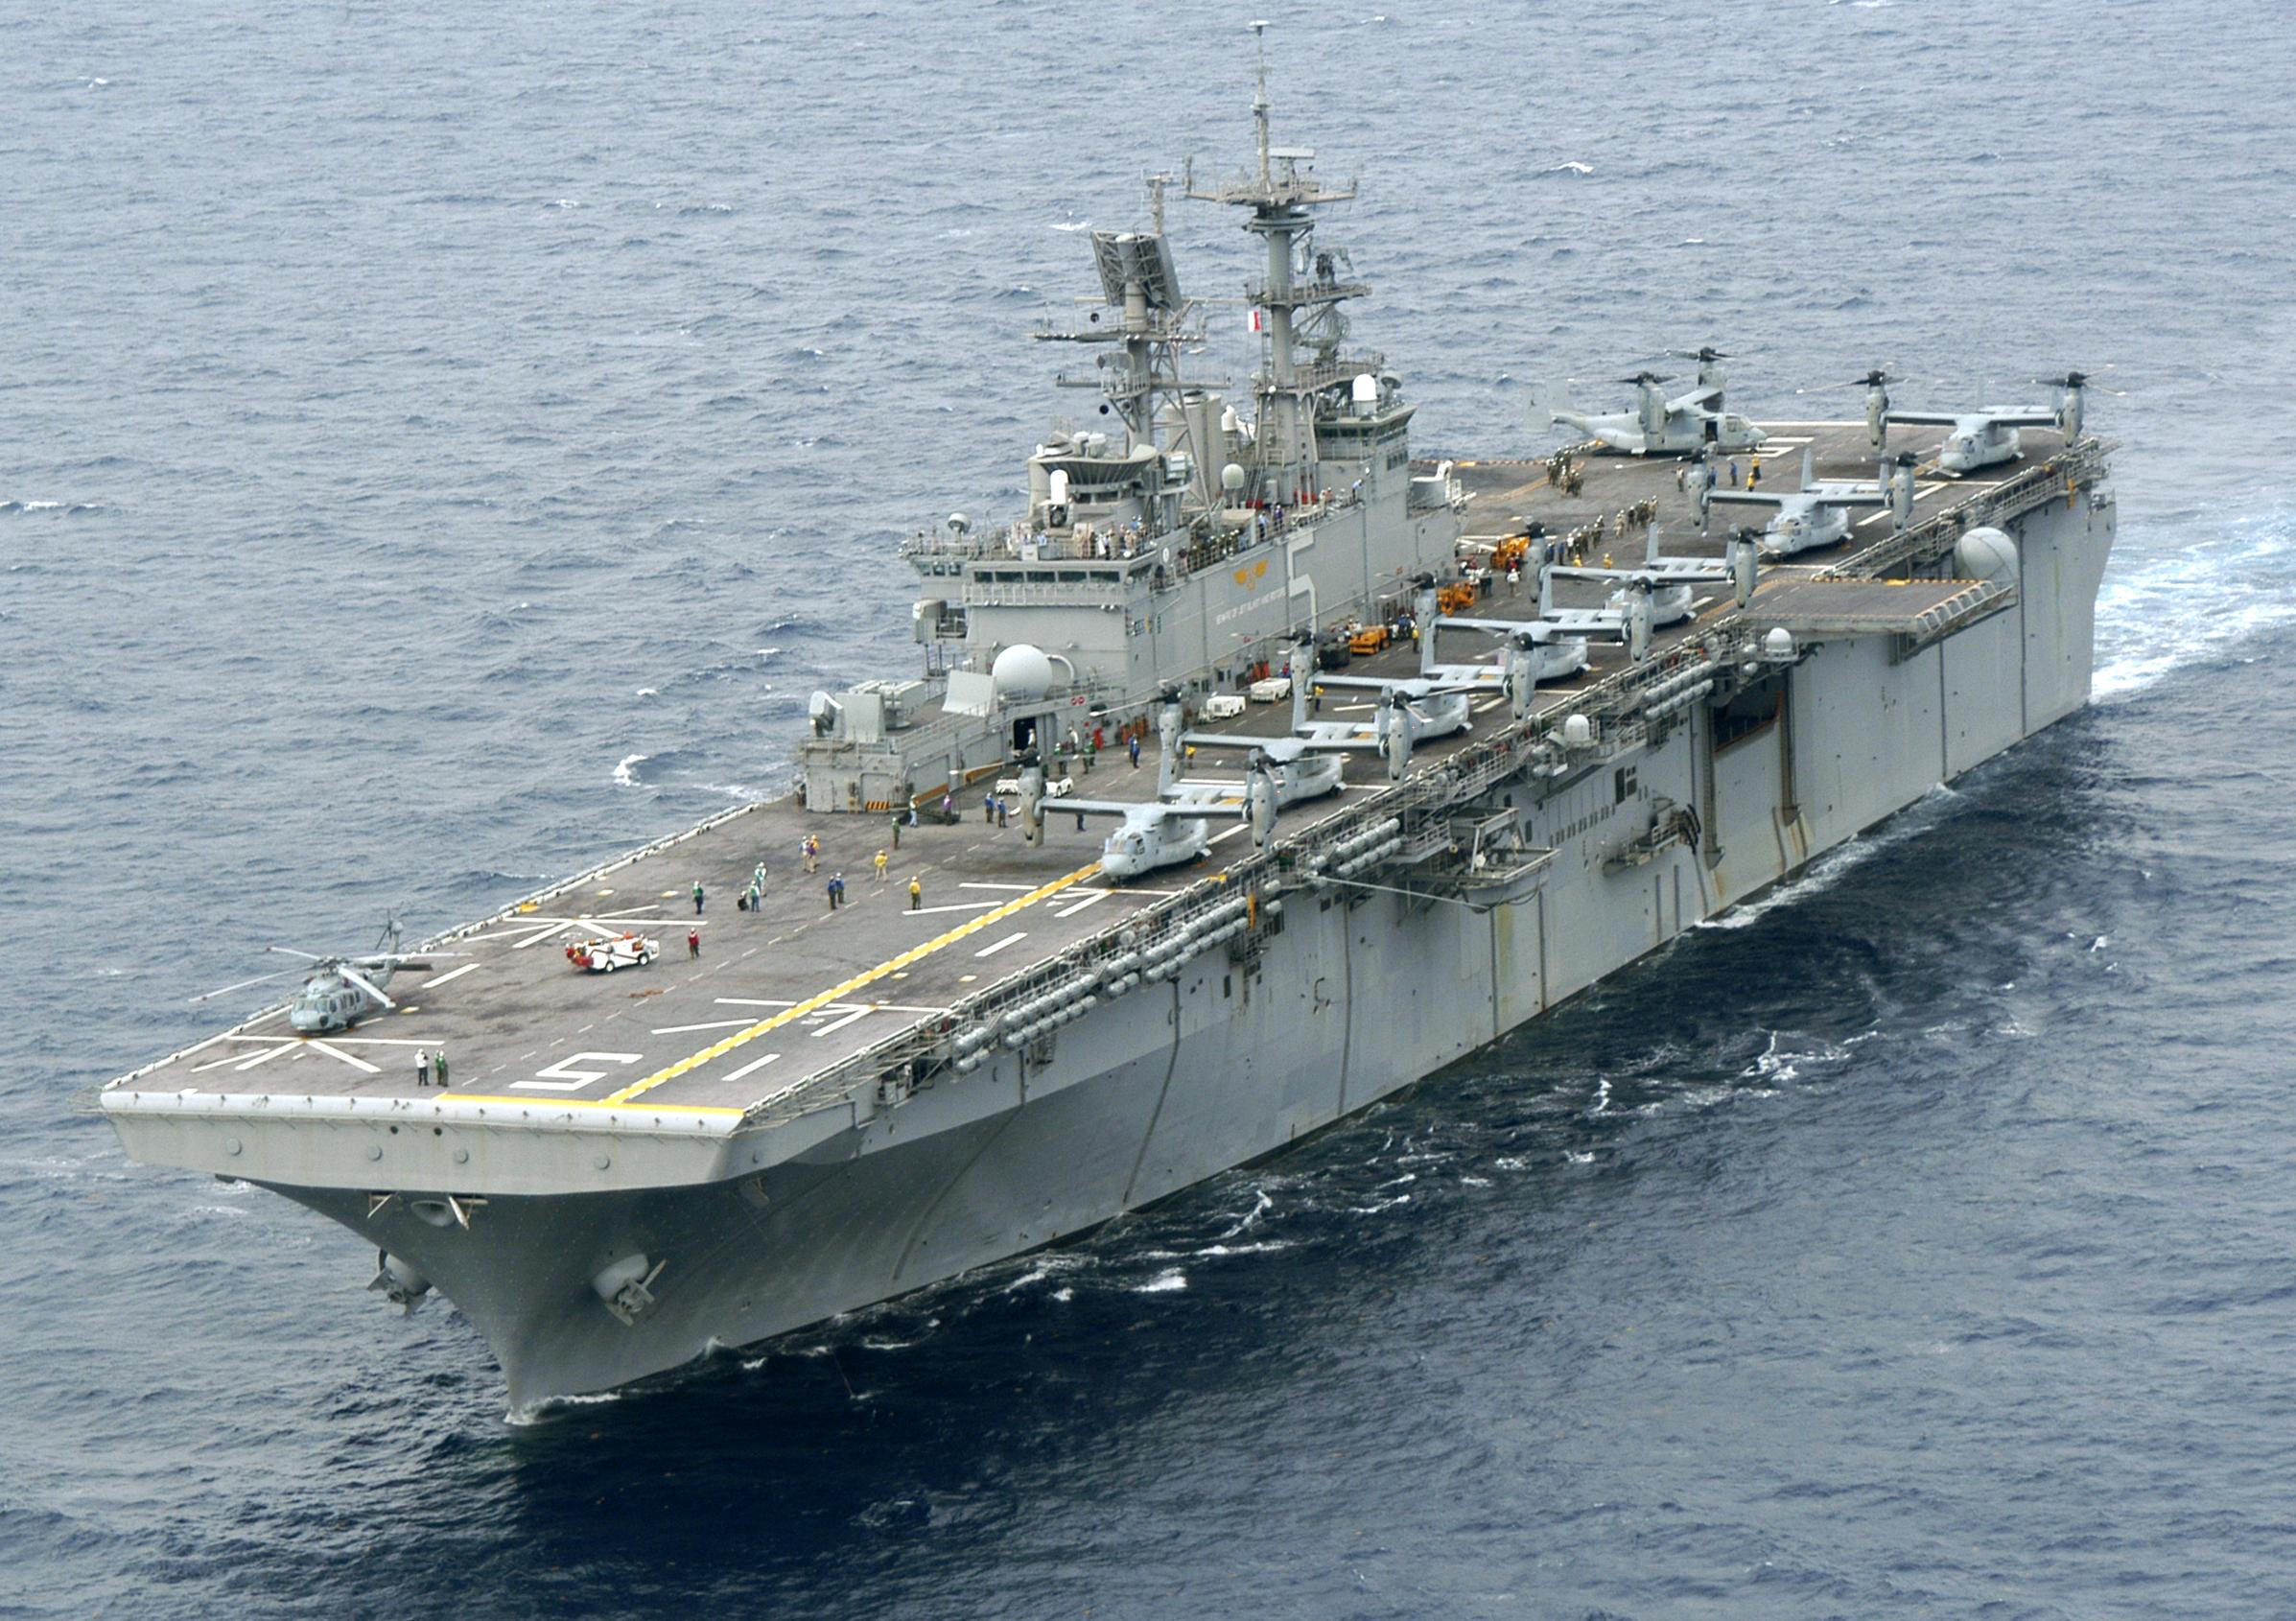 USS BATAAN LHD-5 Bild: U.S. Navy